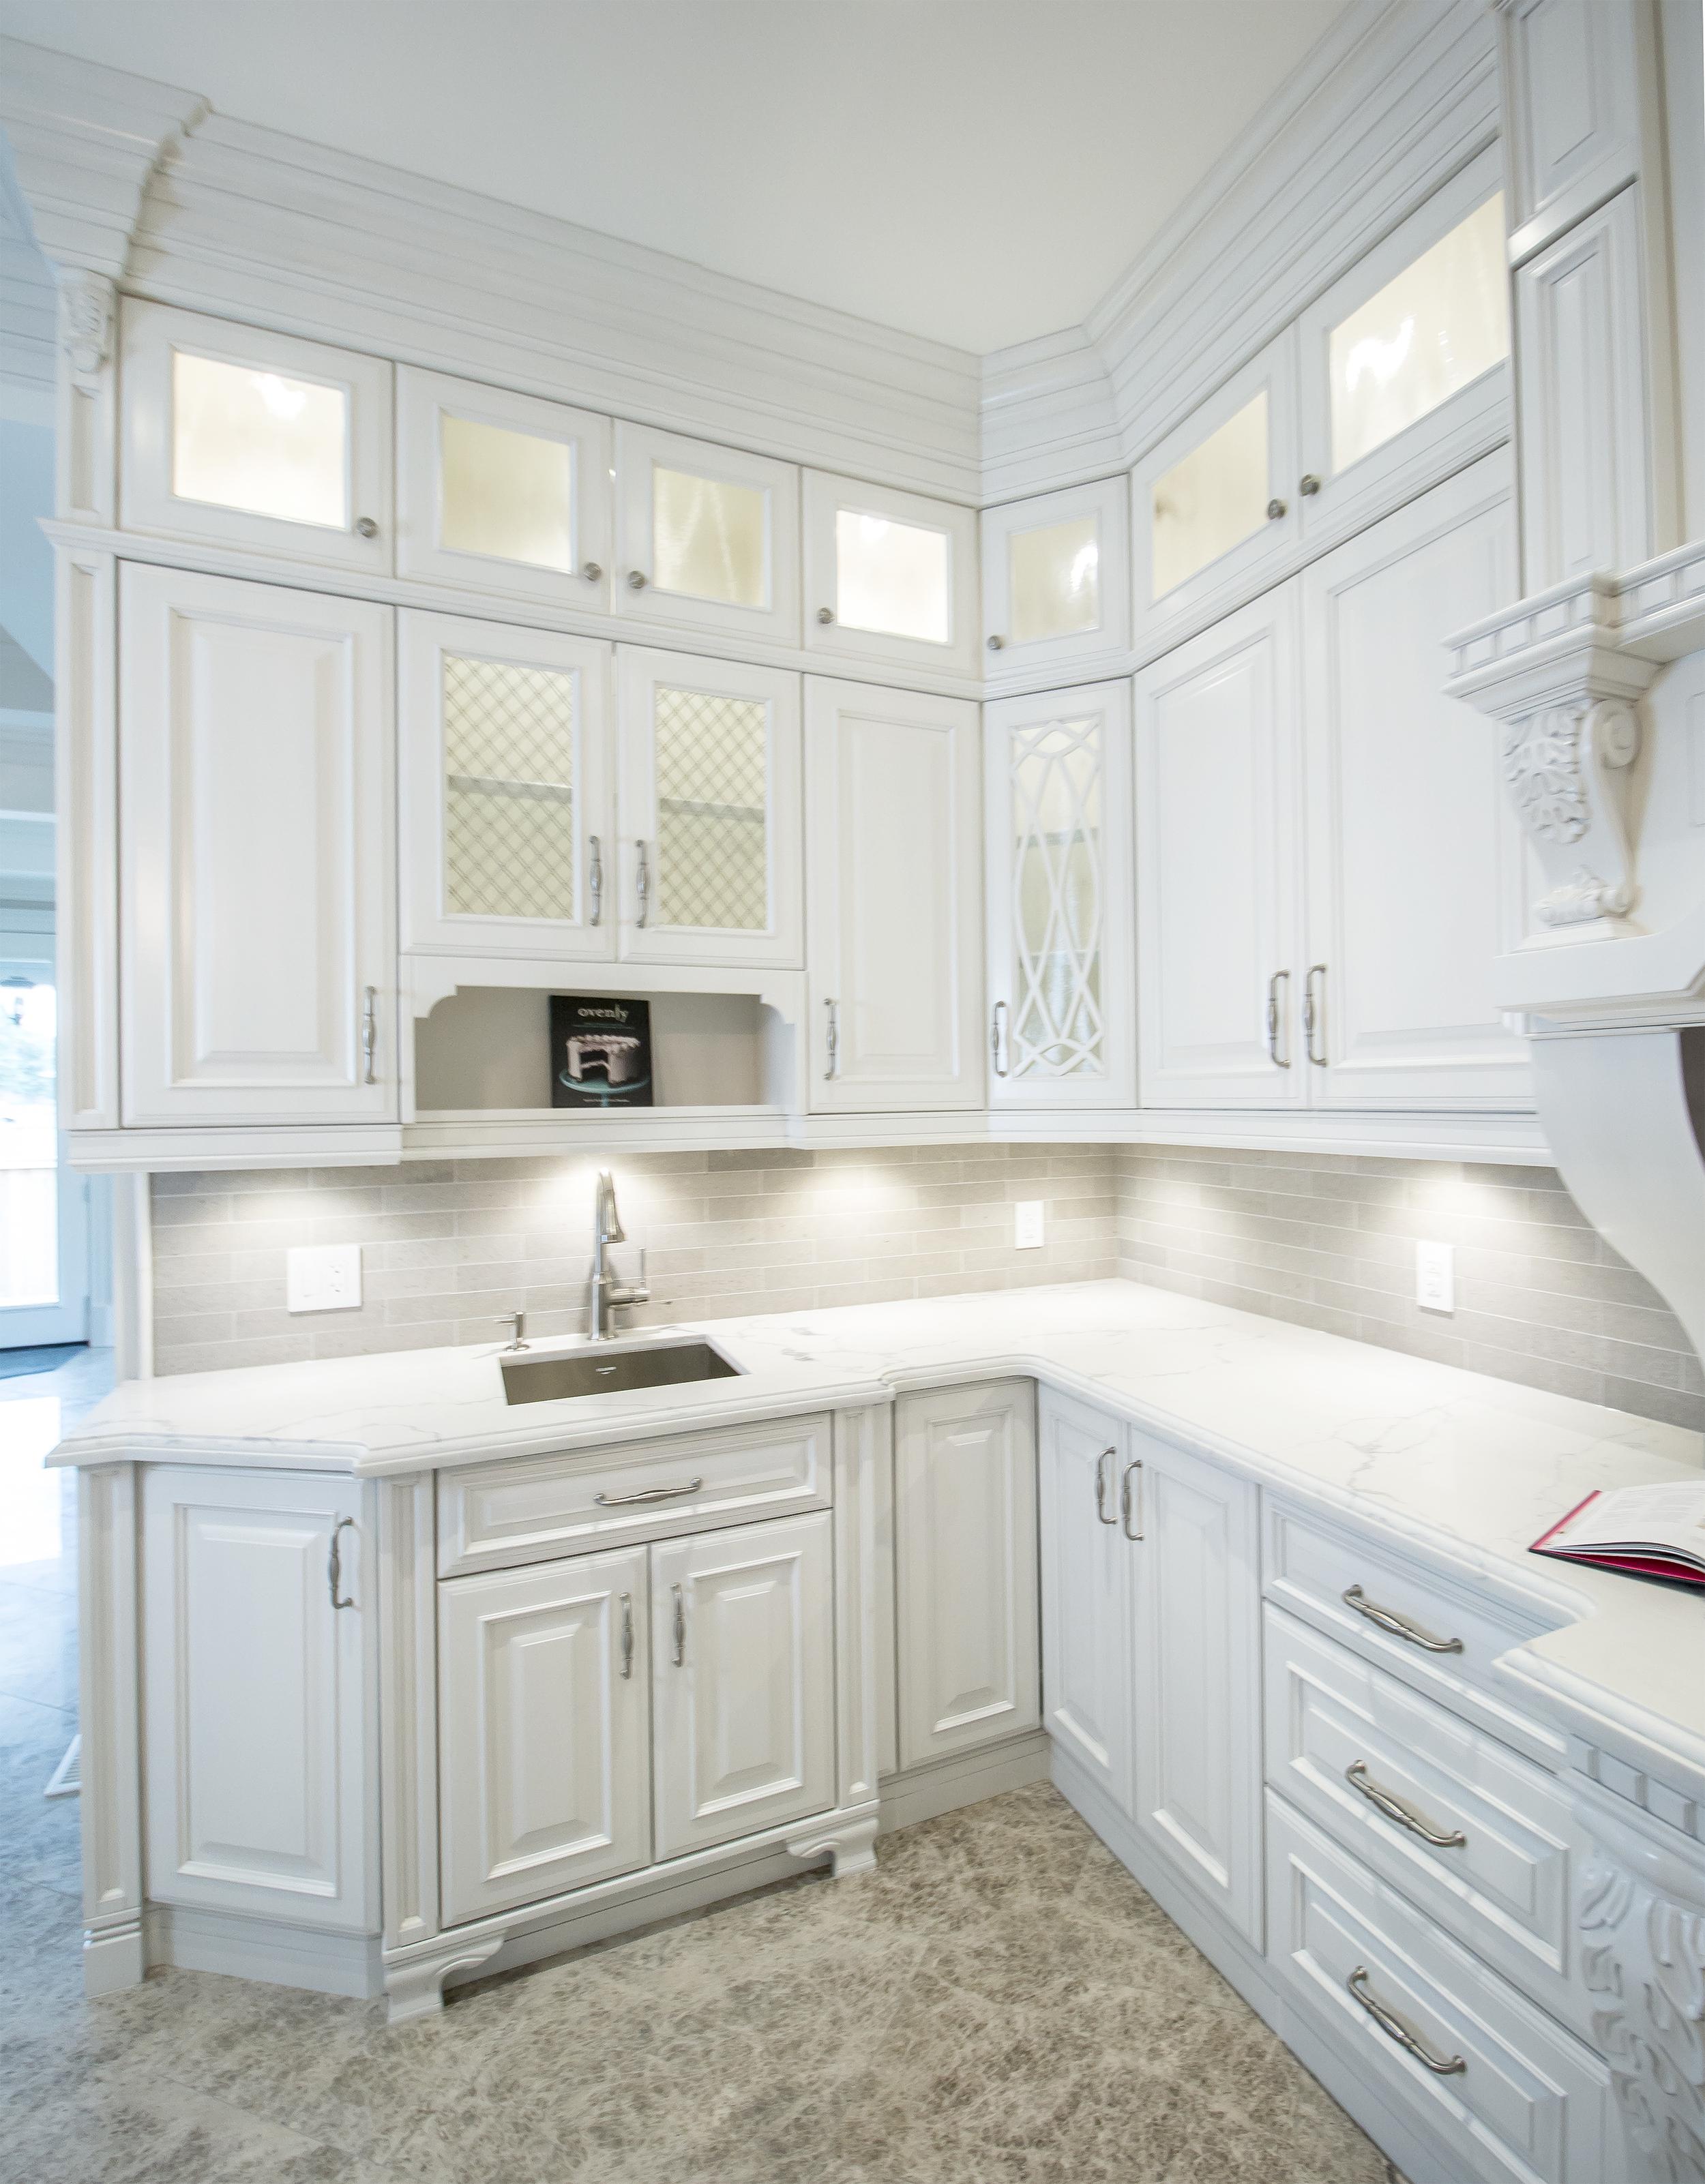 Corner Kitchen pan 1.jpg